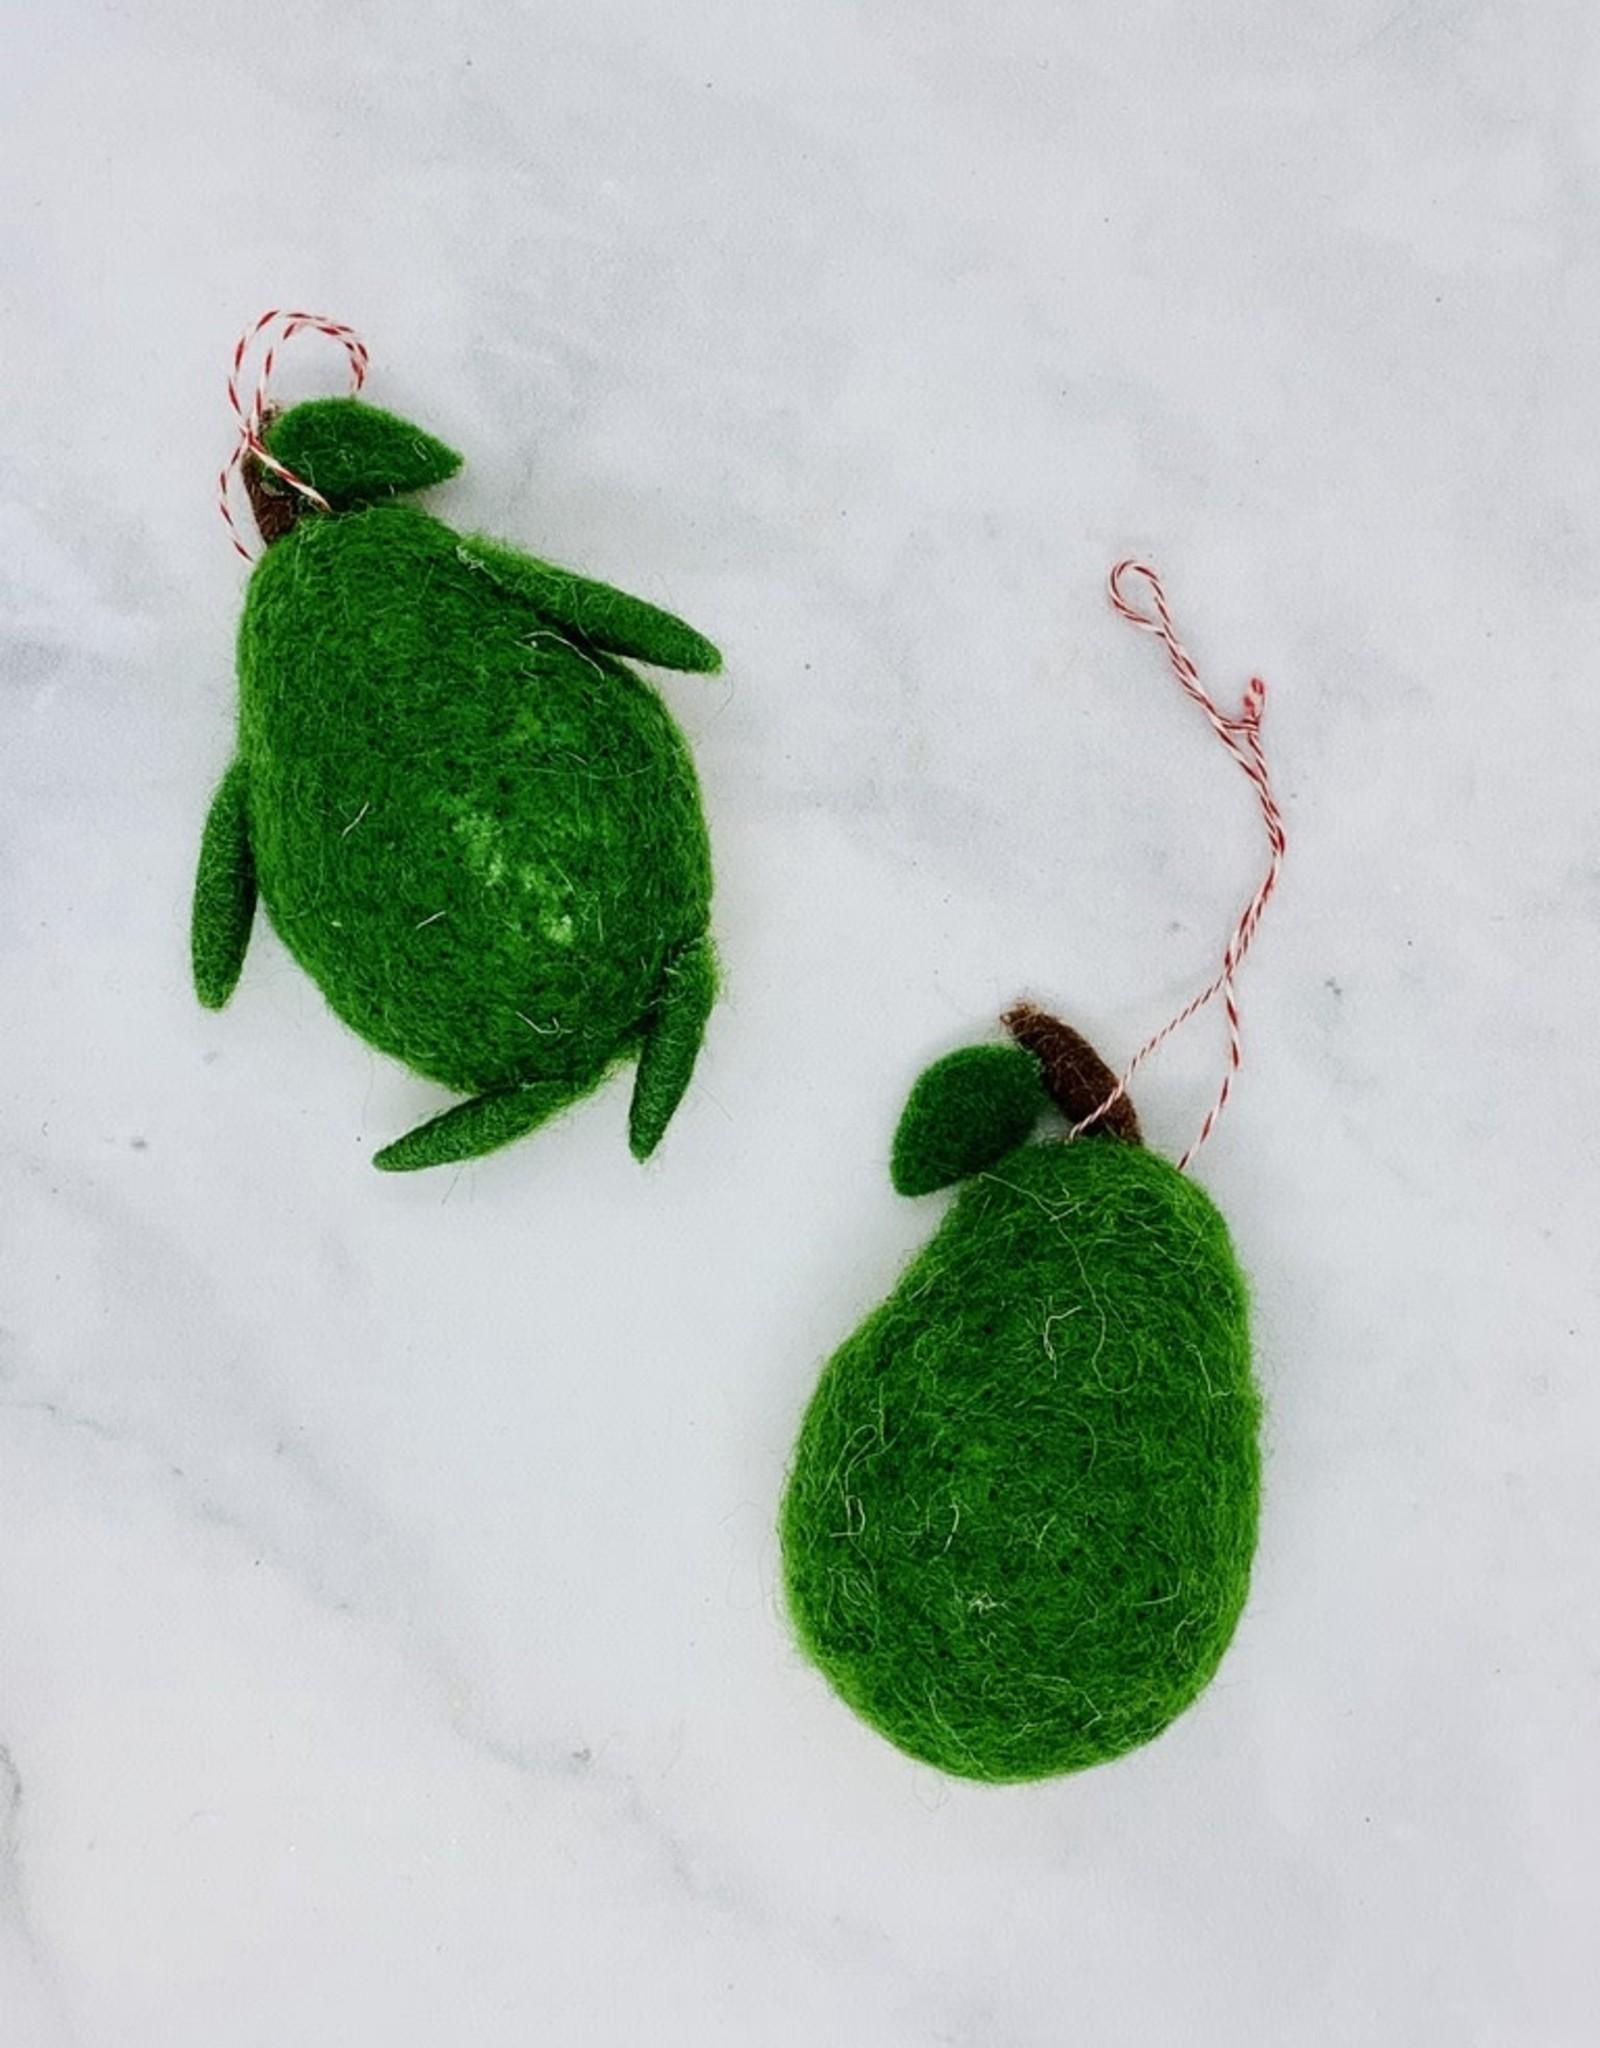 CREATIVECOOP Wool Felt Avocado Ornament